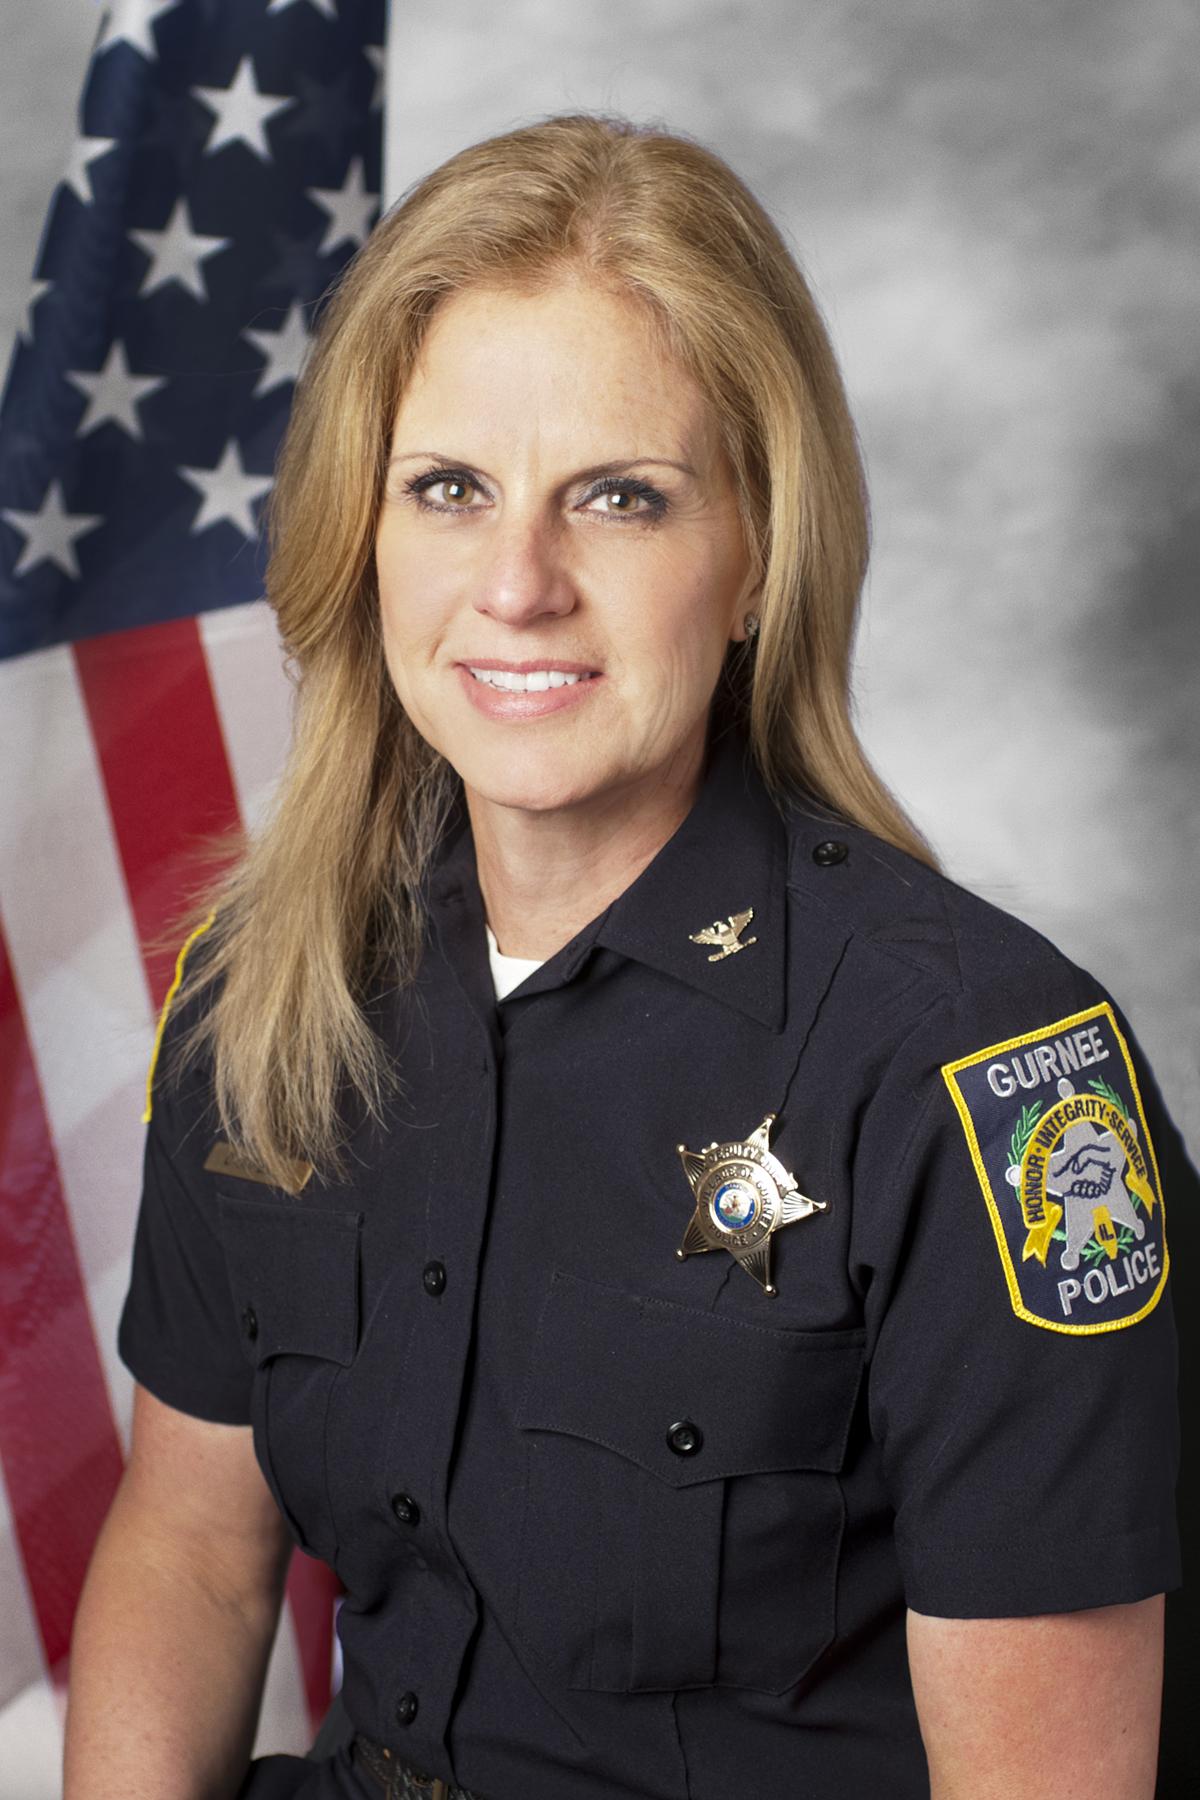 Gurnee Police Deputy Chief Retiring